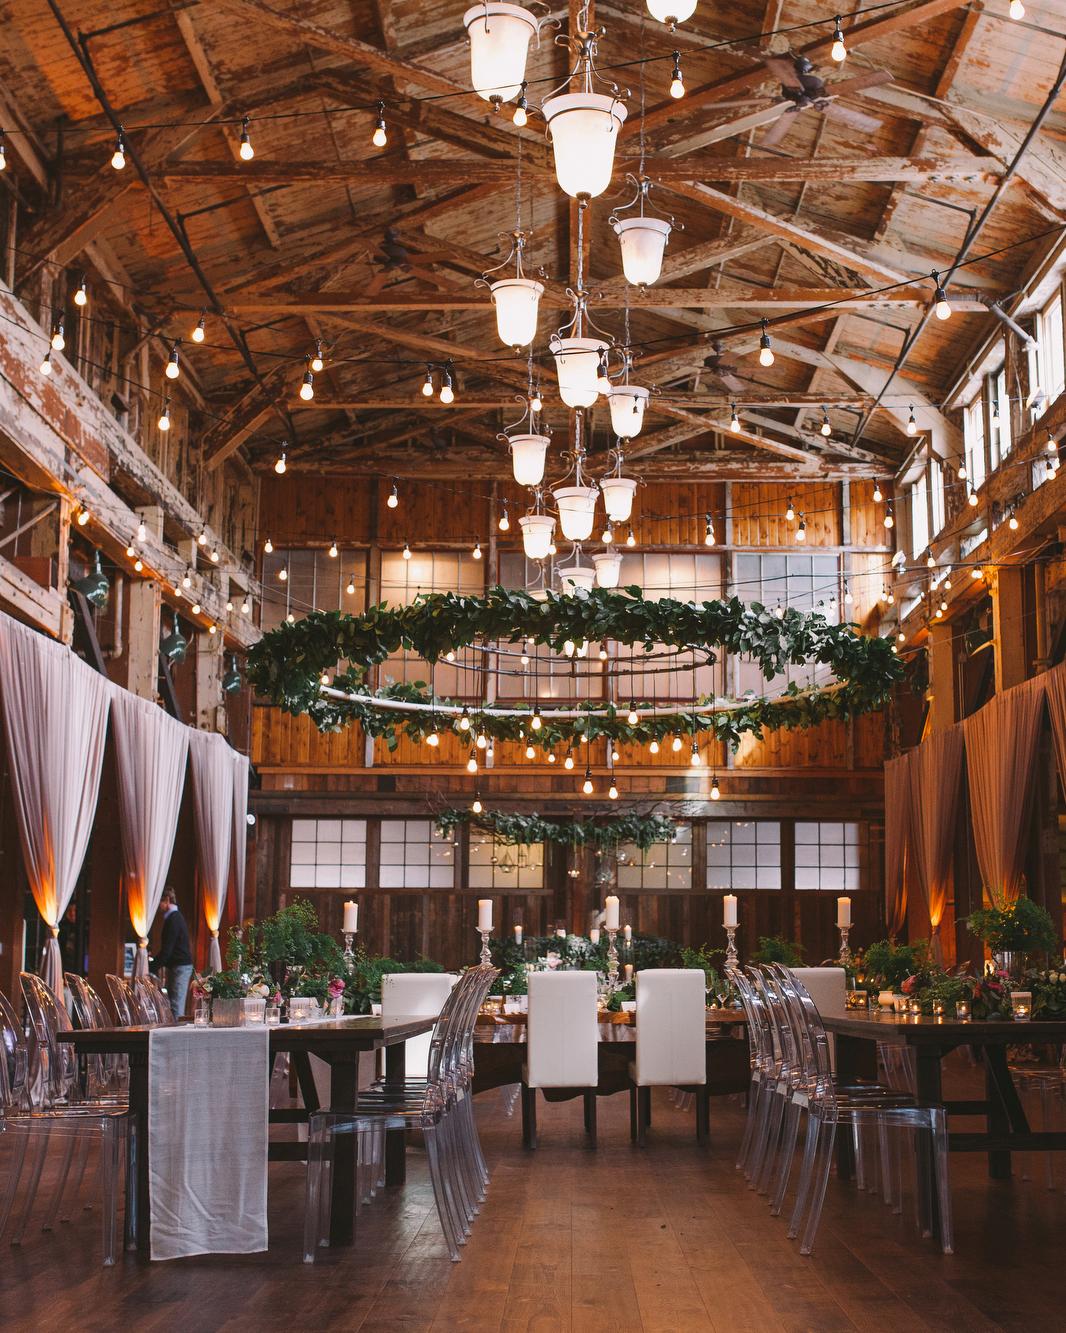 warehouse-wedding-venue-sodo-park-seattle-washington-0815.jpg